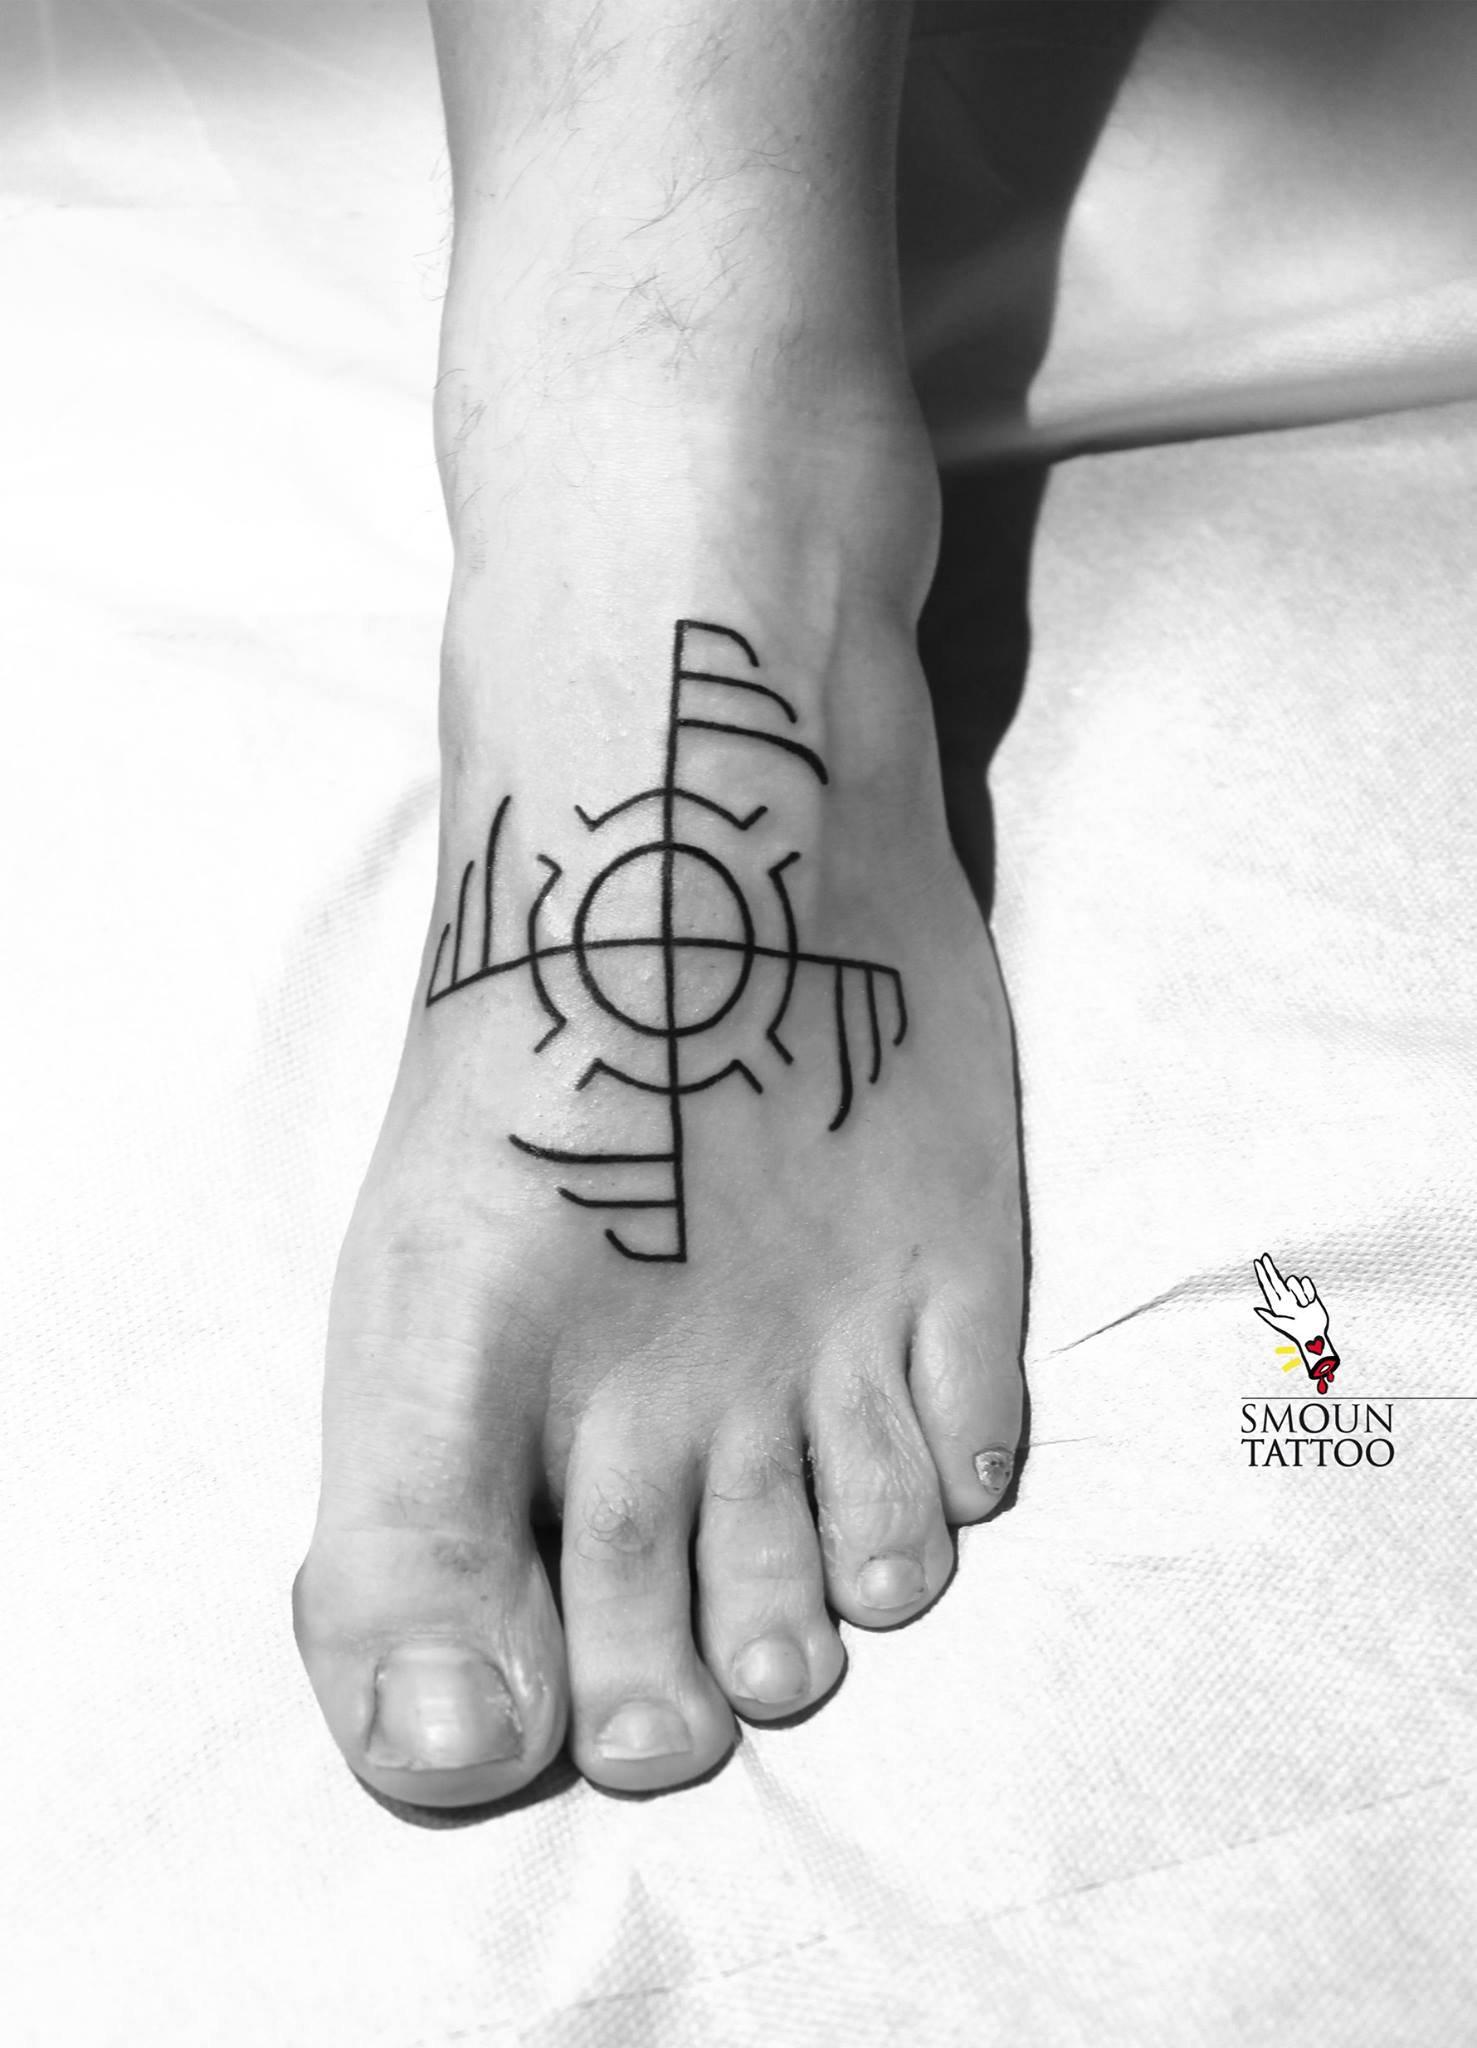 Lettering Tatuaggio Smoun Tattoo a Bari